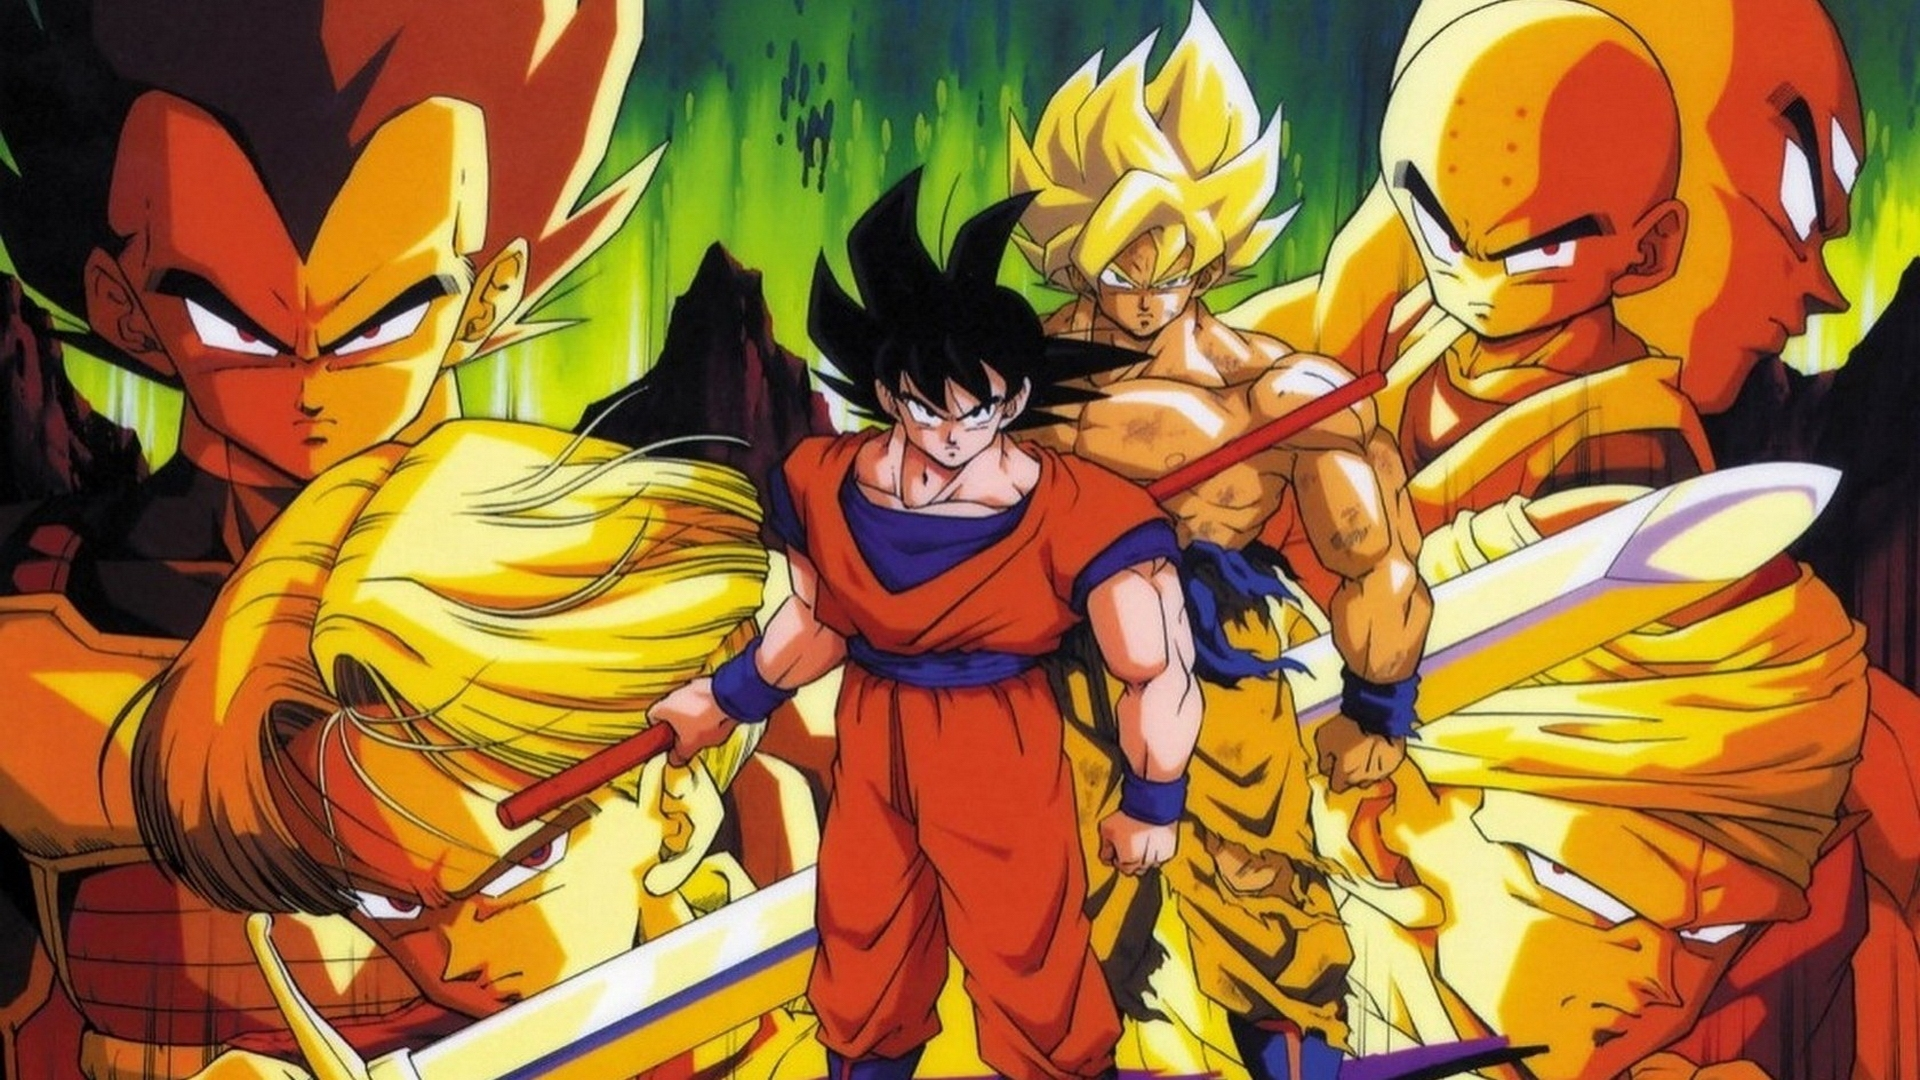 Dragon Ball Z Images Goku Download - Dragon Ball Z Wallpapers Hd Download - HD Wallpaper